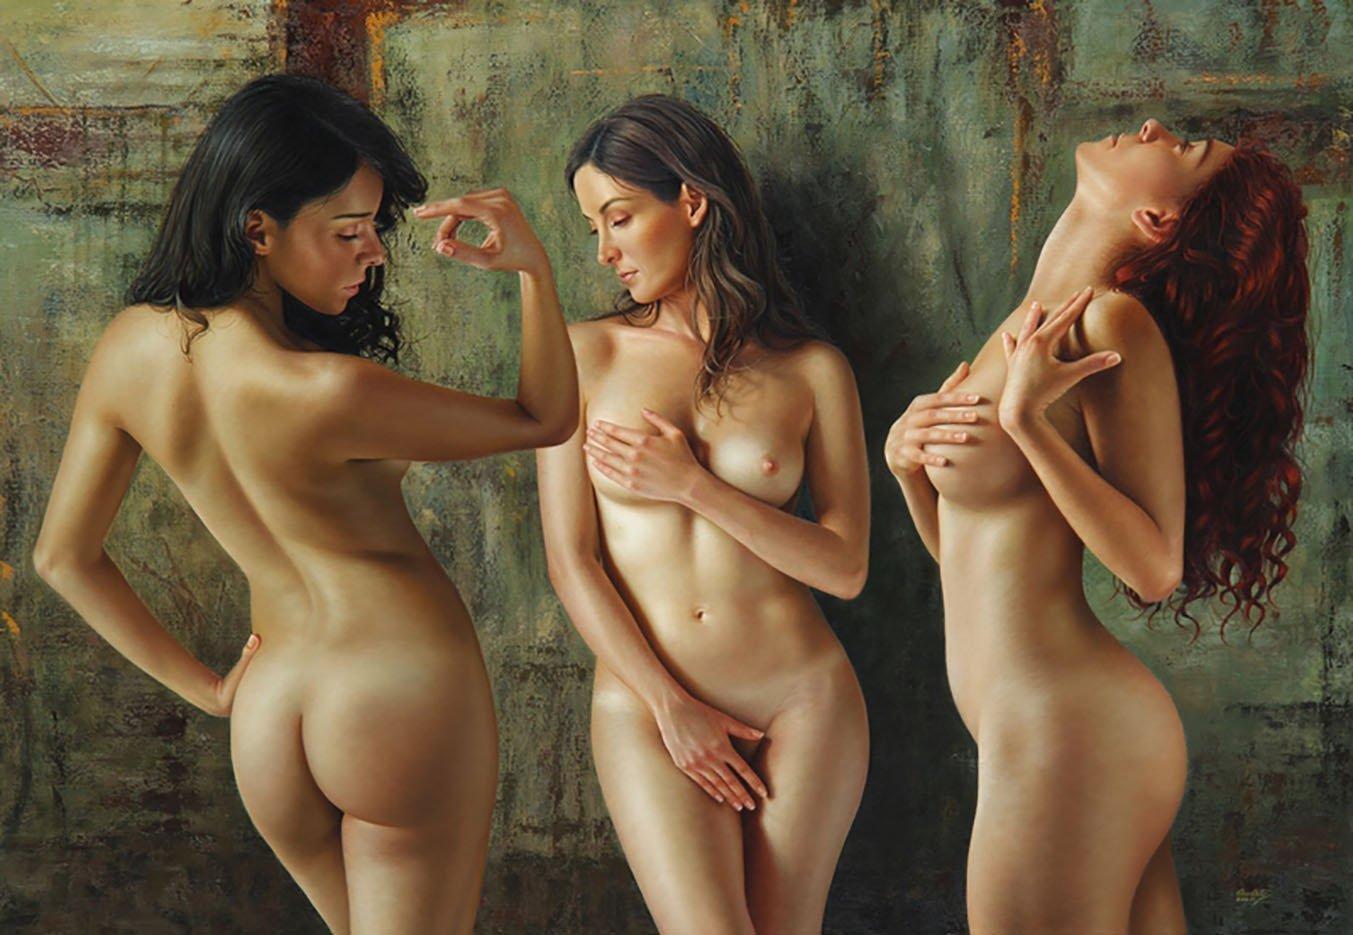 Erotic nude photo